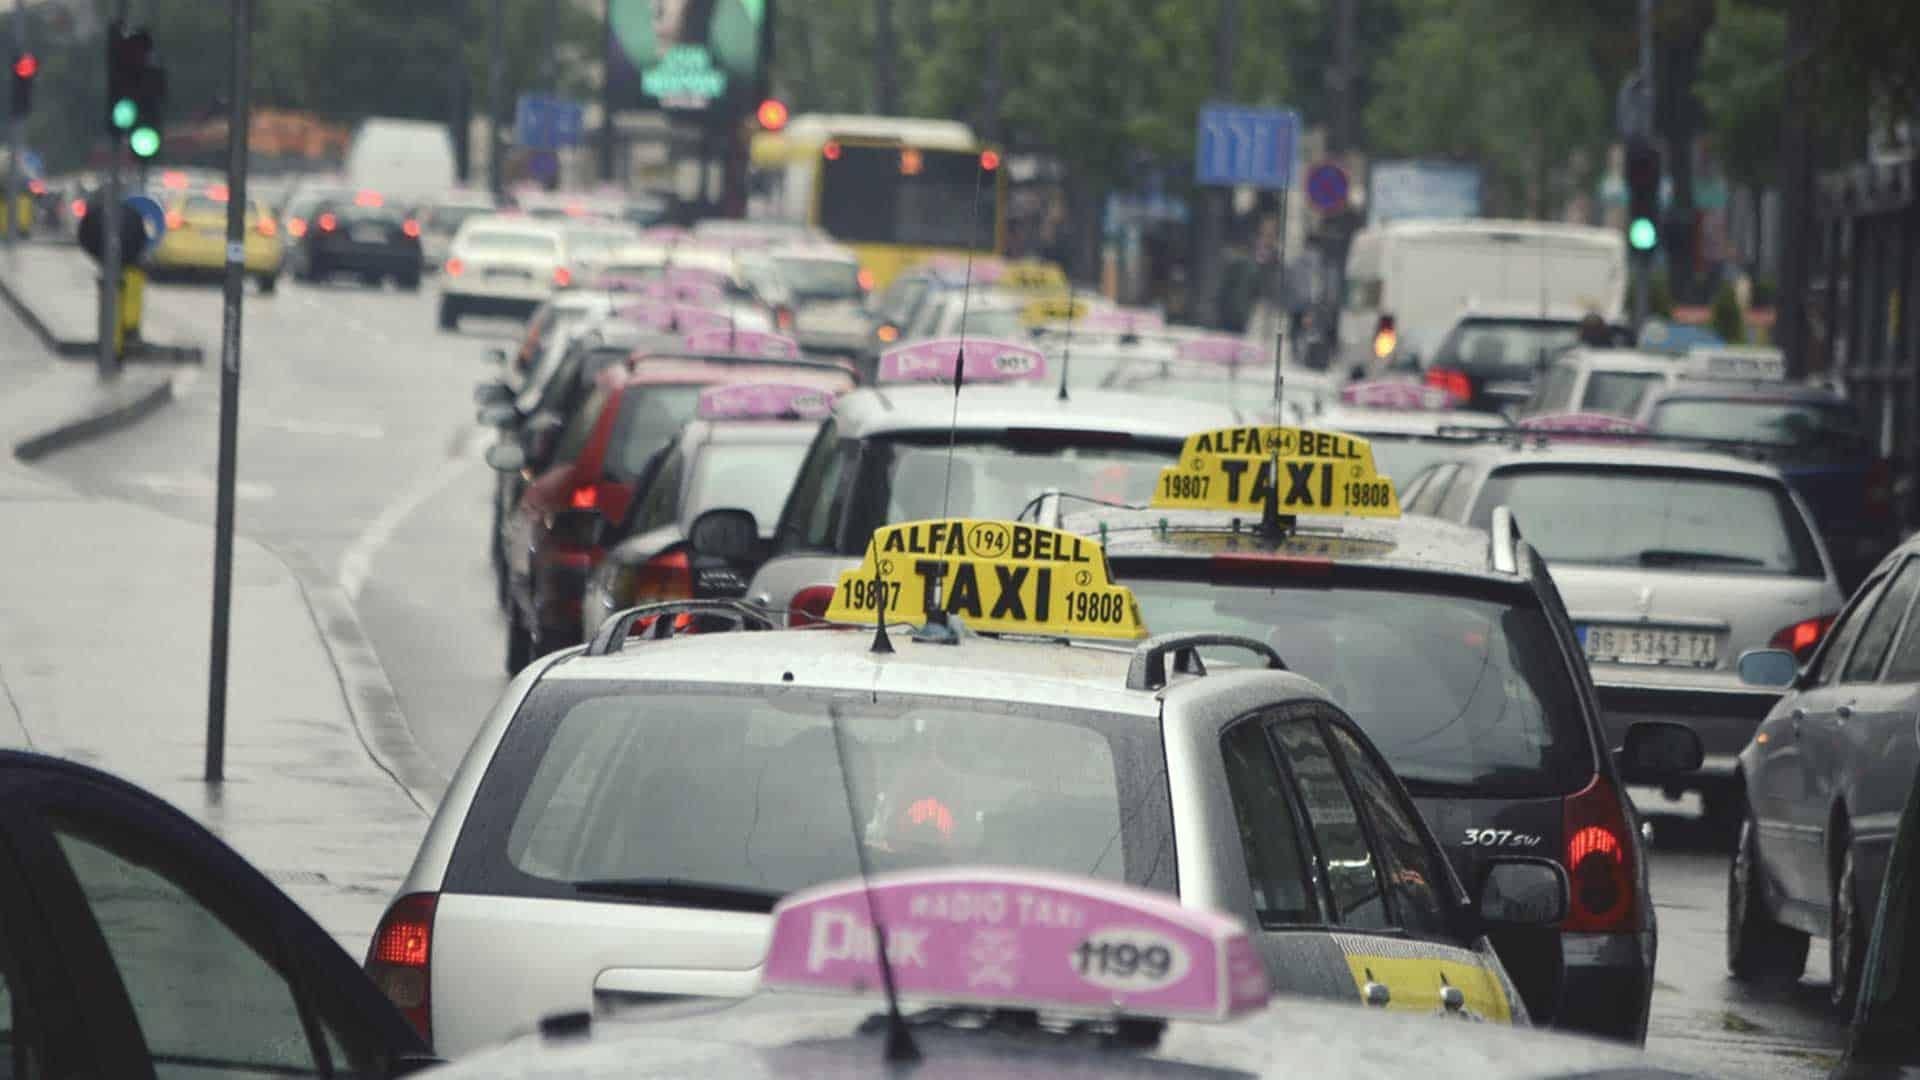 Taksi udruženja Beograd